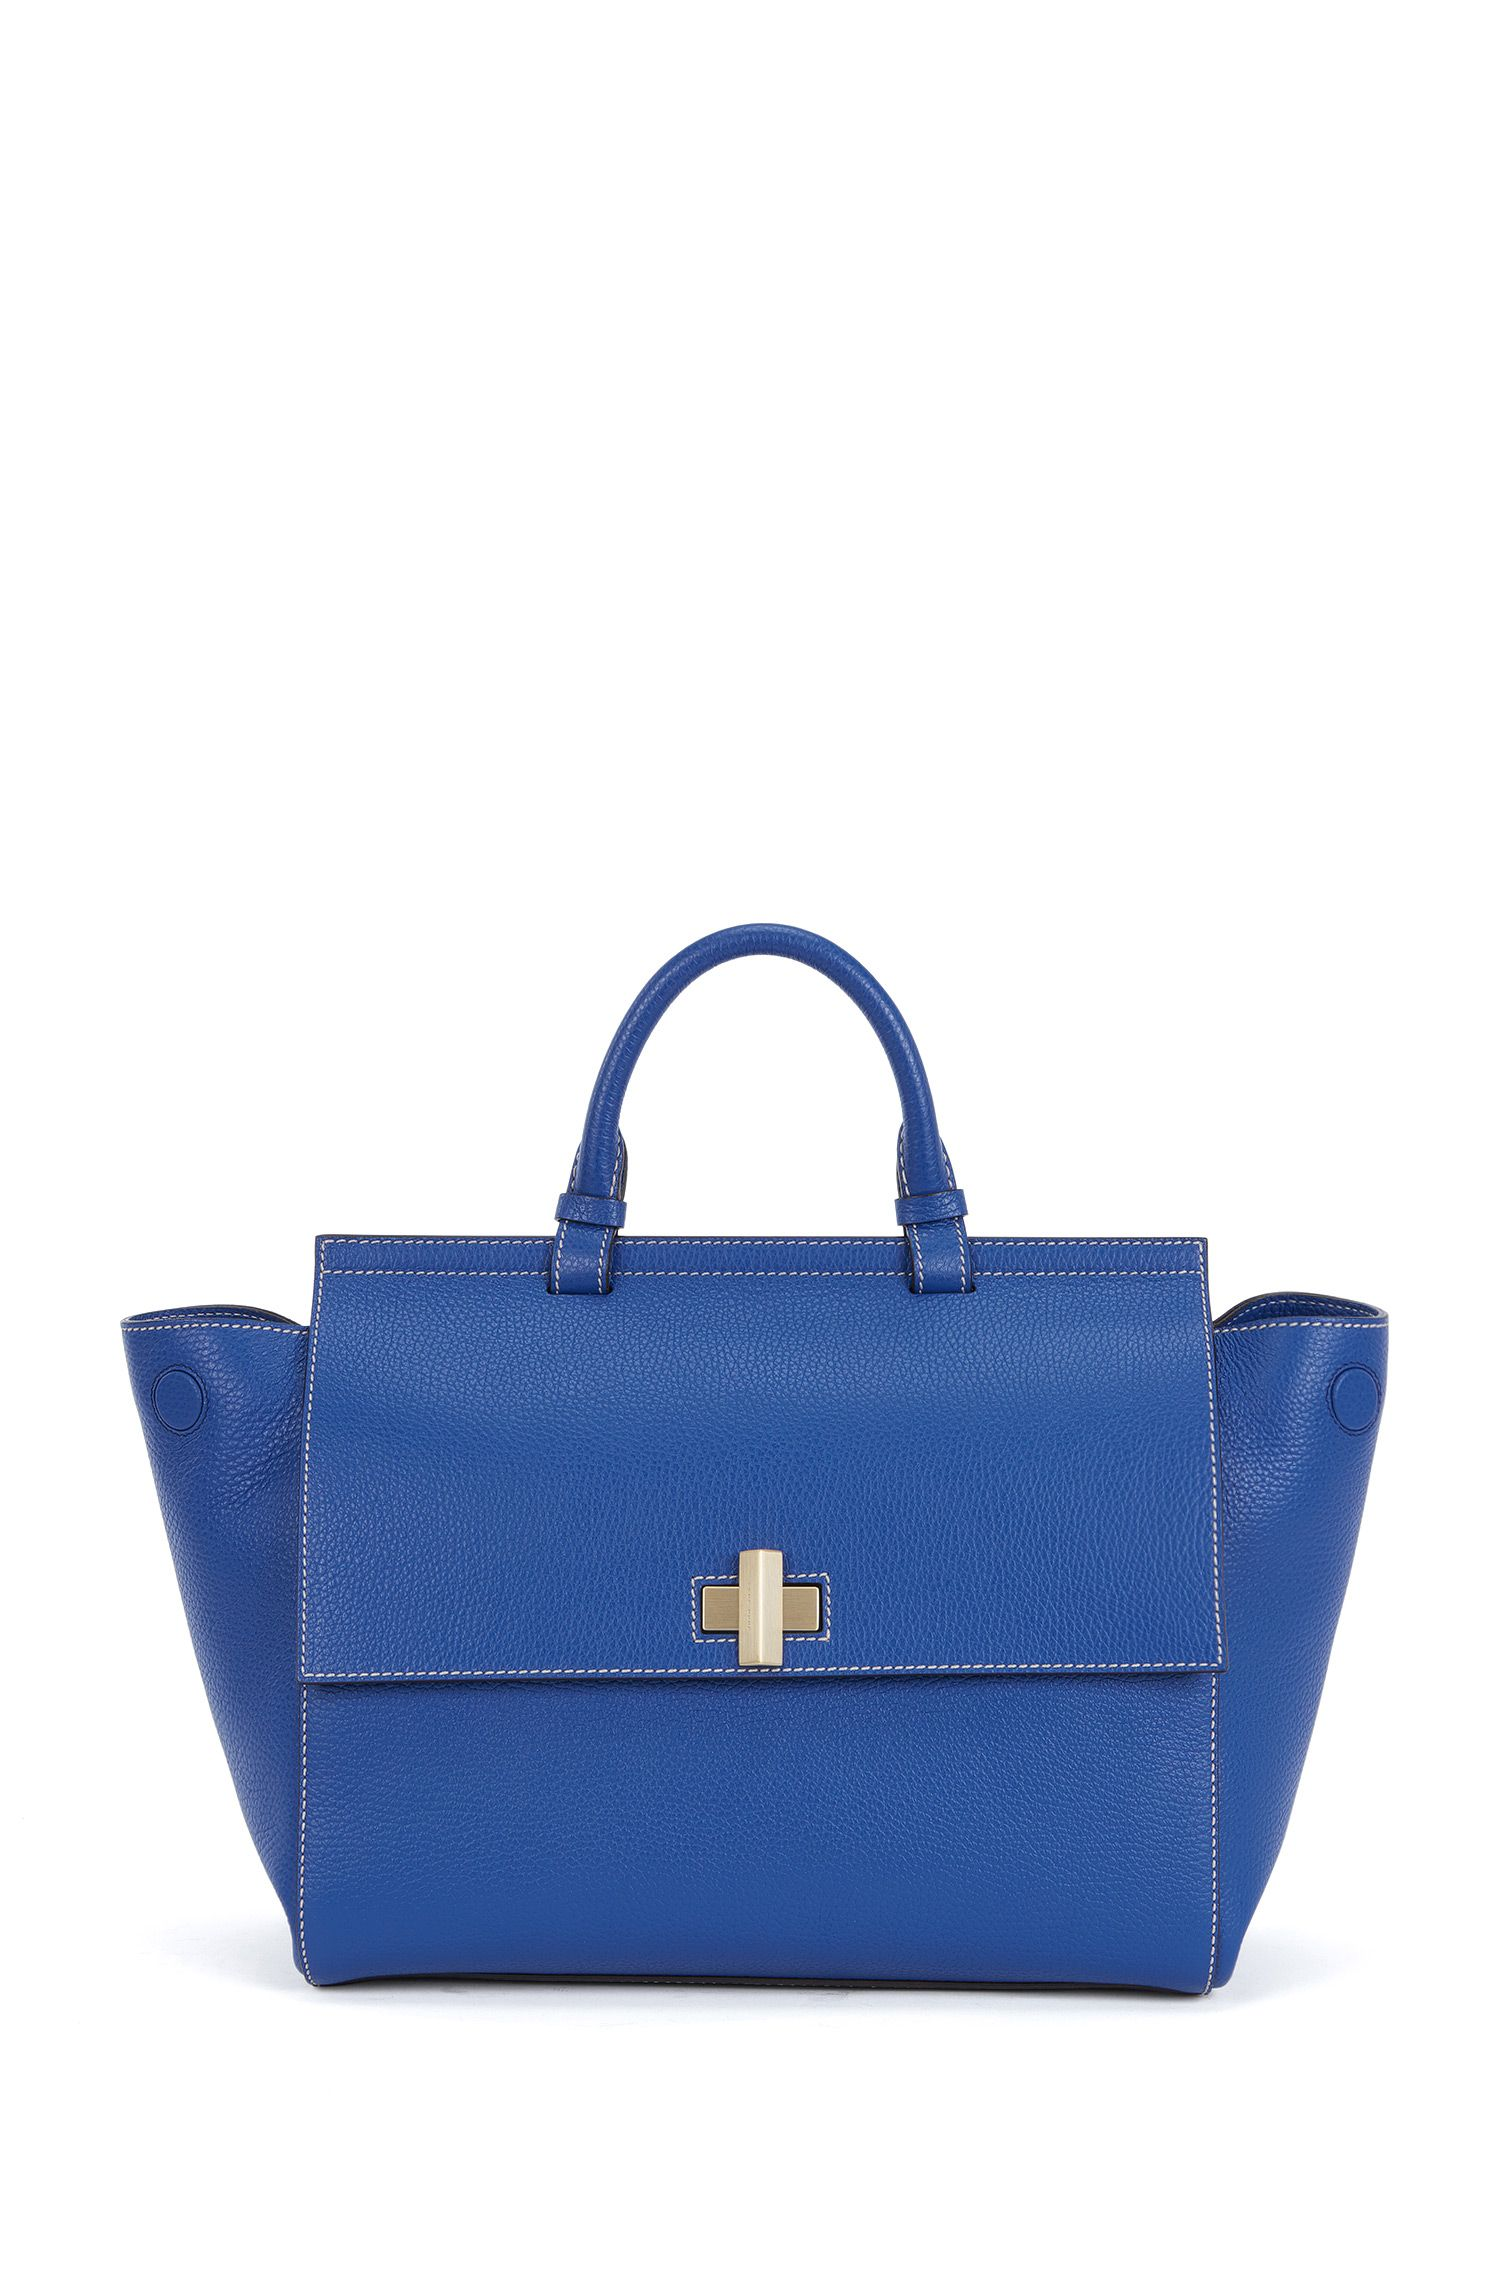 'BOSS Bespoke Soft M'   Leather Grained Satchel Handbag